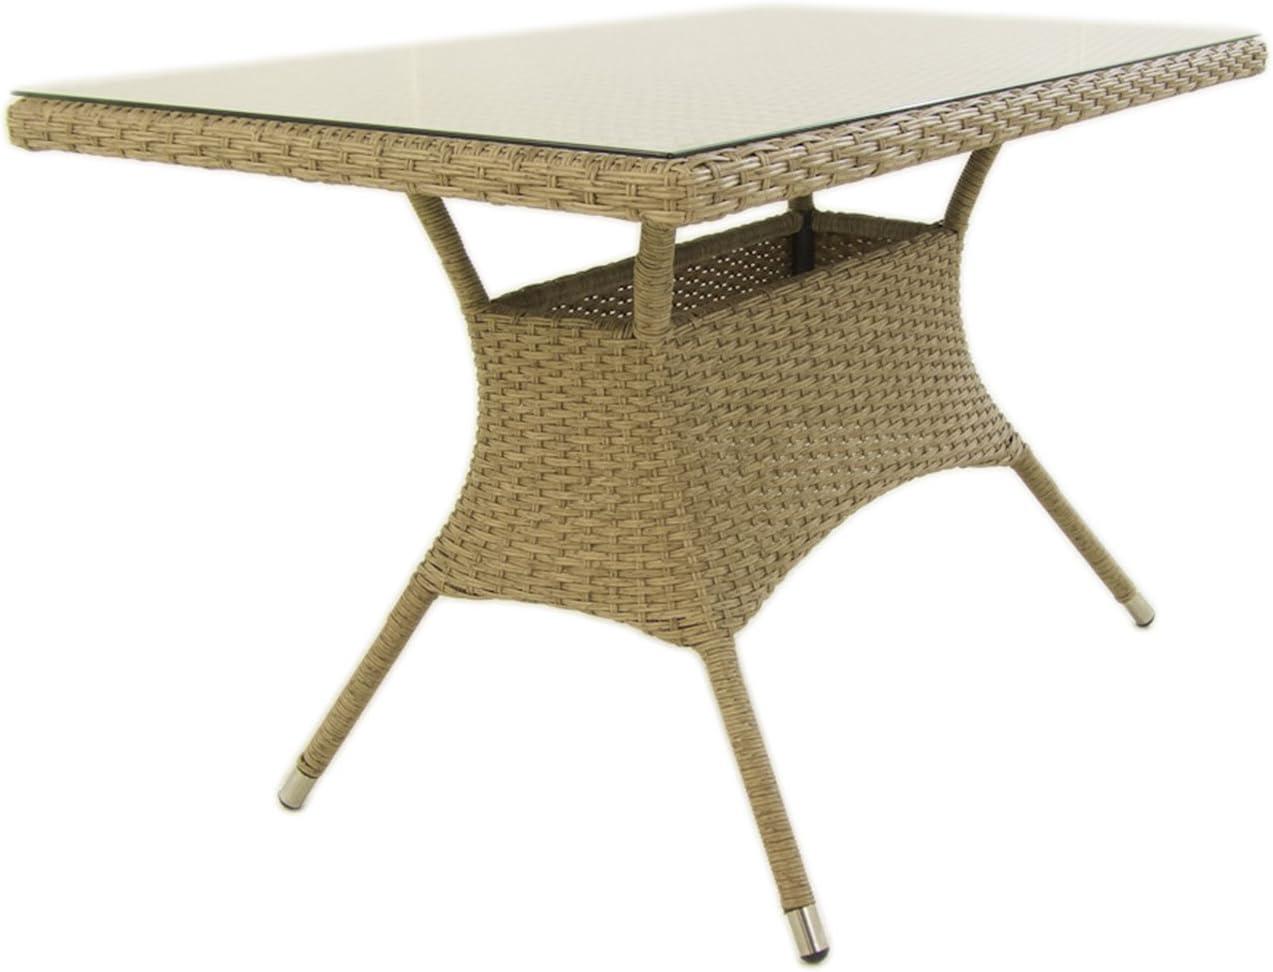 Mesa de jardín Rectangular, Tamaño: 120x70x74 cm, Aluminio y ratán ...